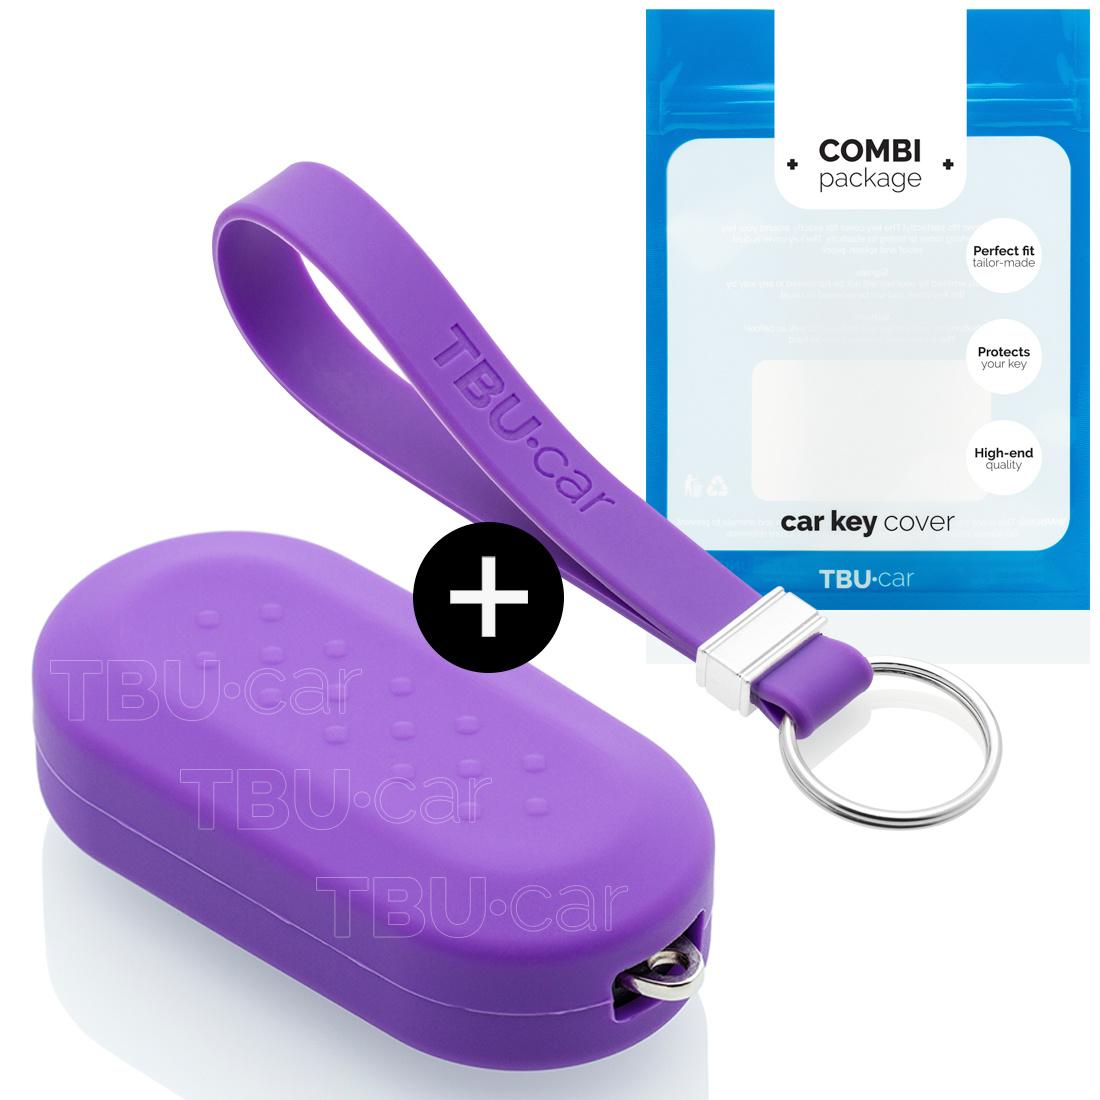 TBU car TBU car Autoschlüssel Hülle kompatibel mit Fiat 3 Tasten - Schutzhülle aus Silikon - Auto Schlüsselhülle Cover in Violett